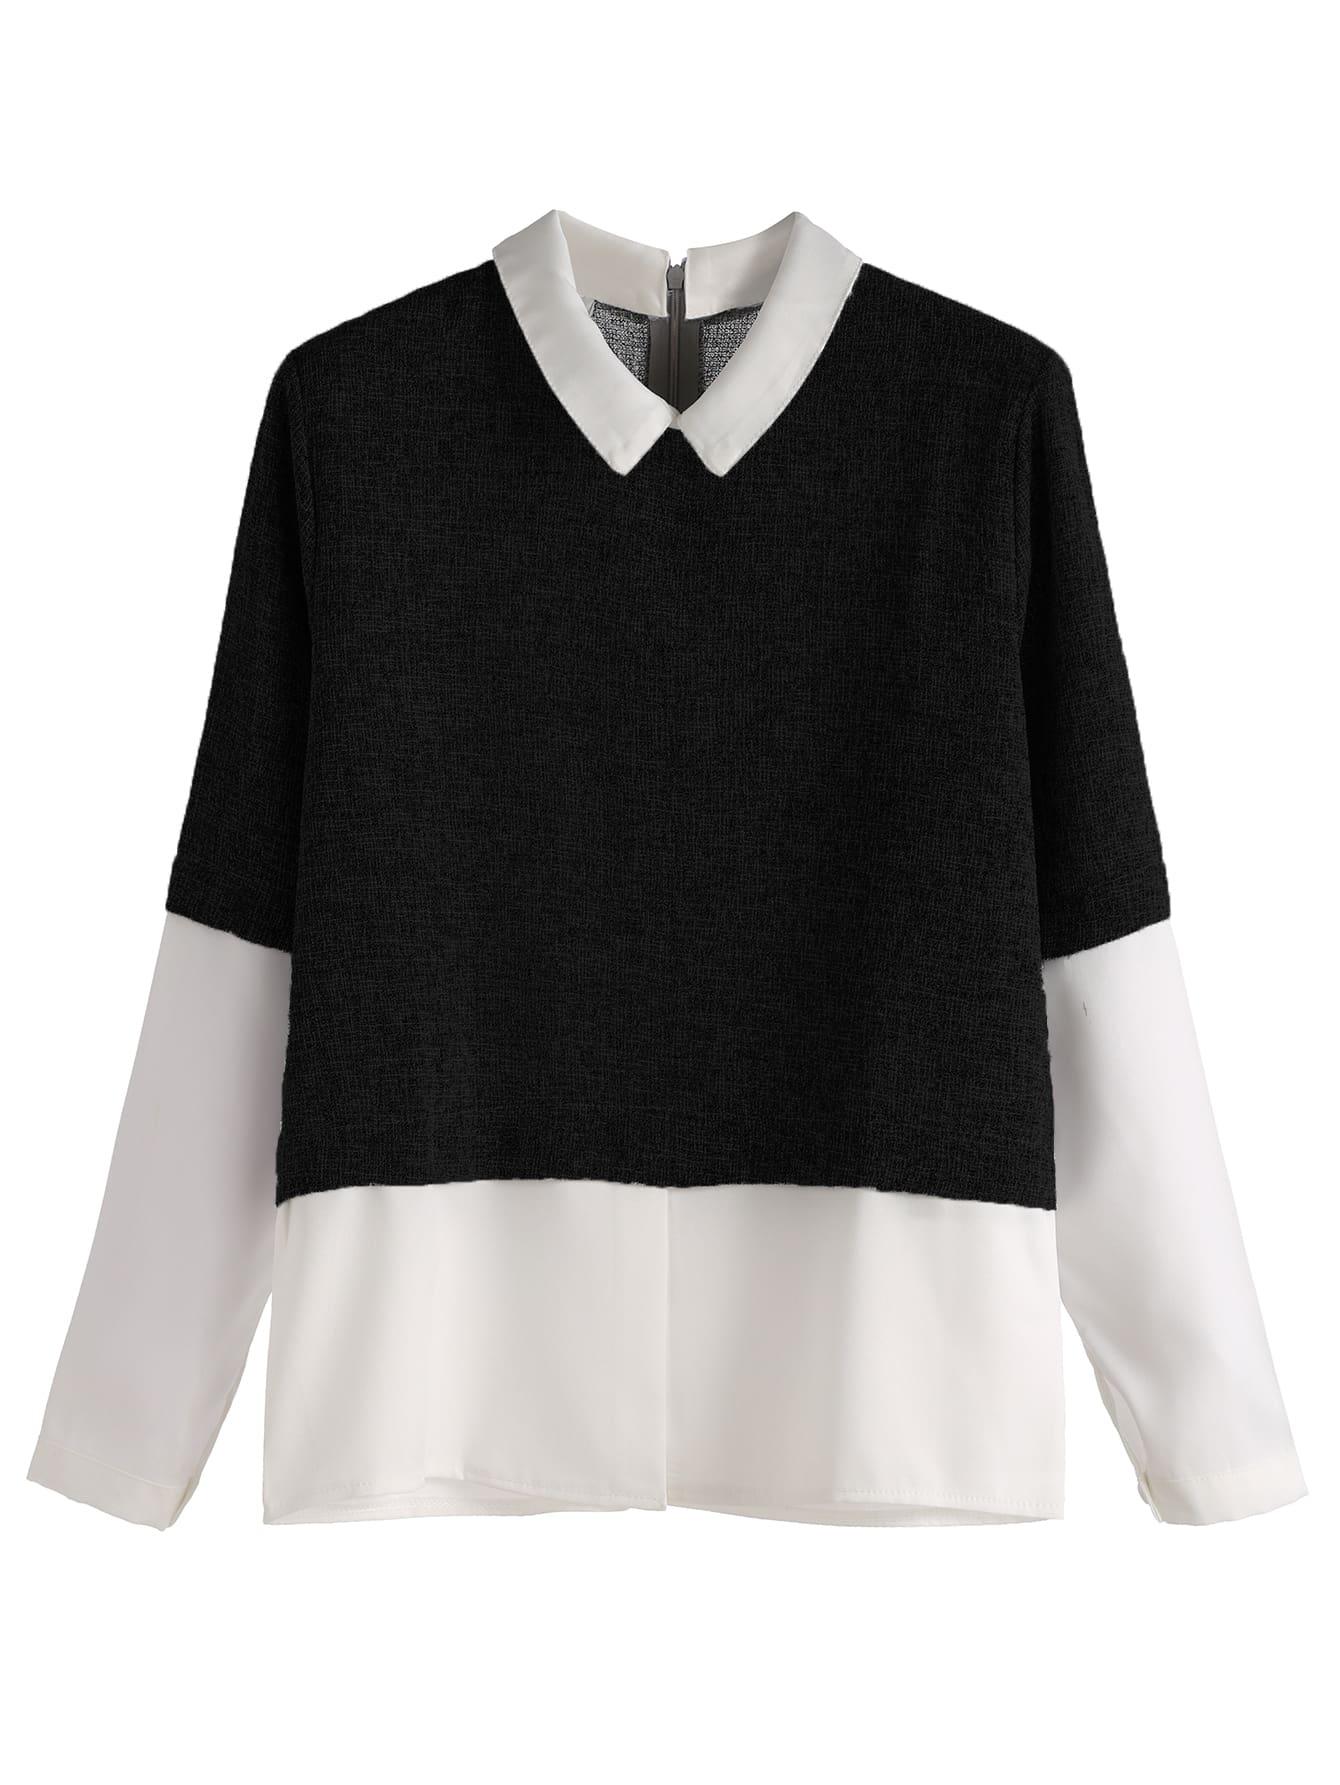 Black Contrast Zip Back Top blouse161014103